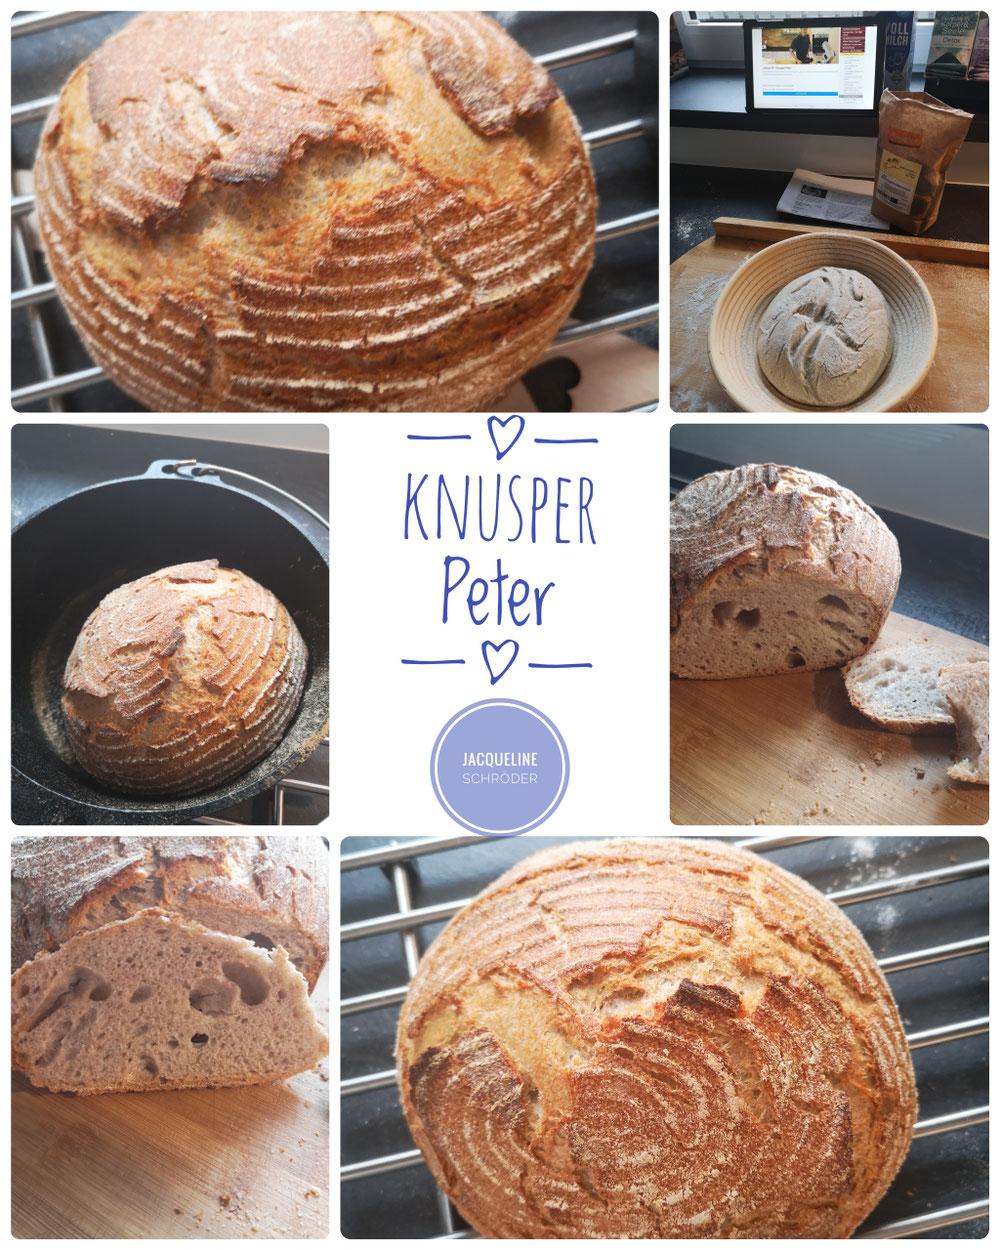 Knusper Peter